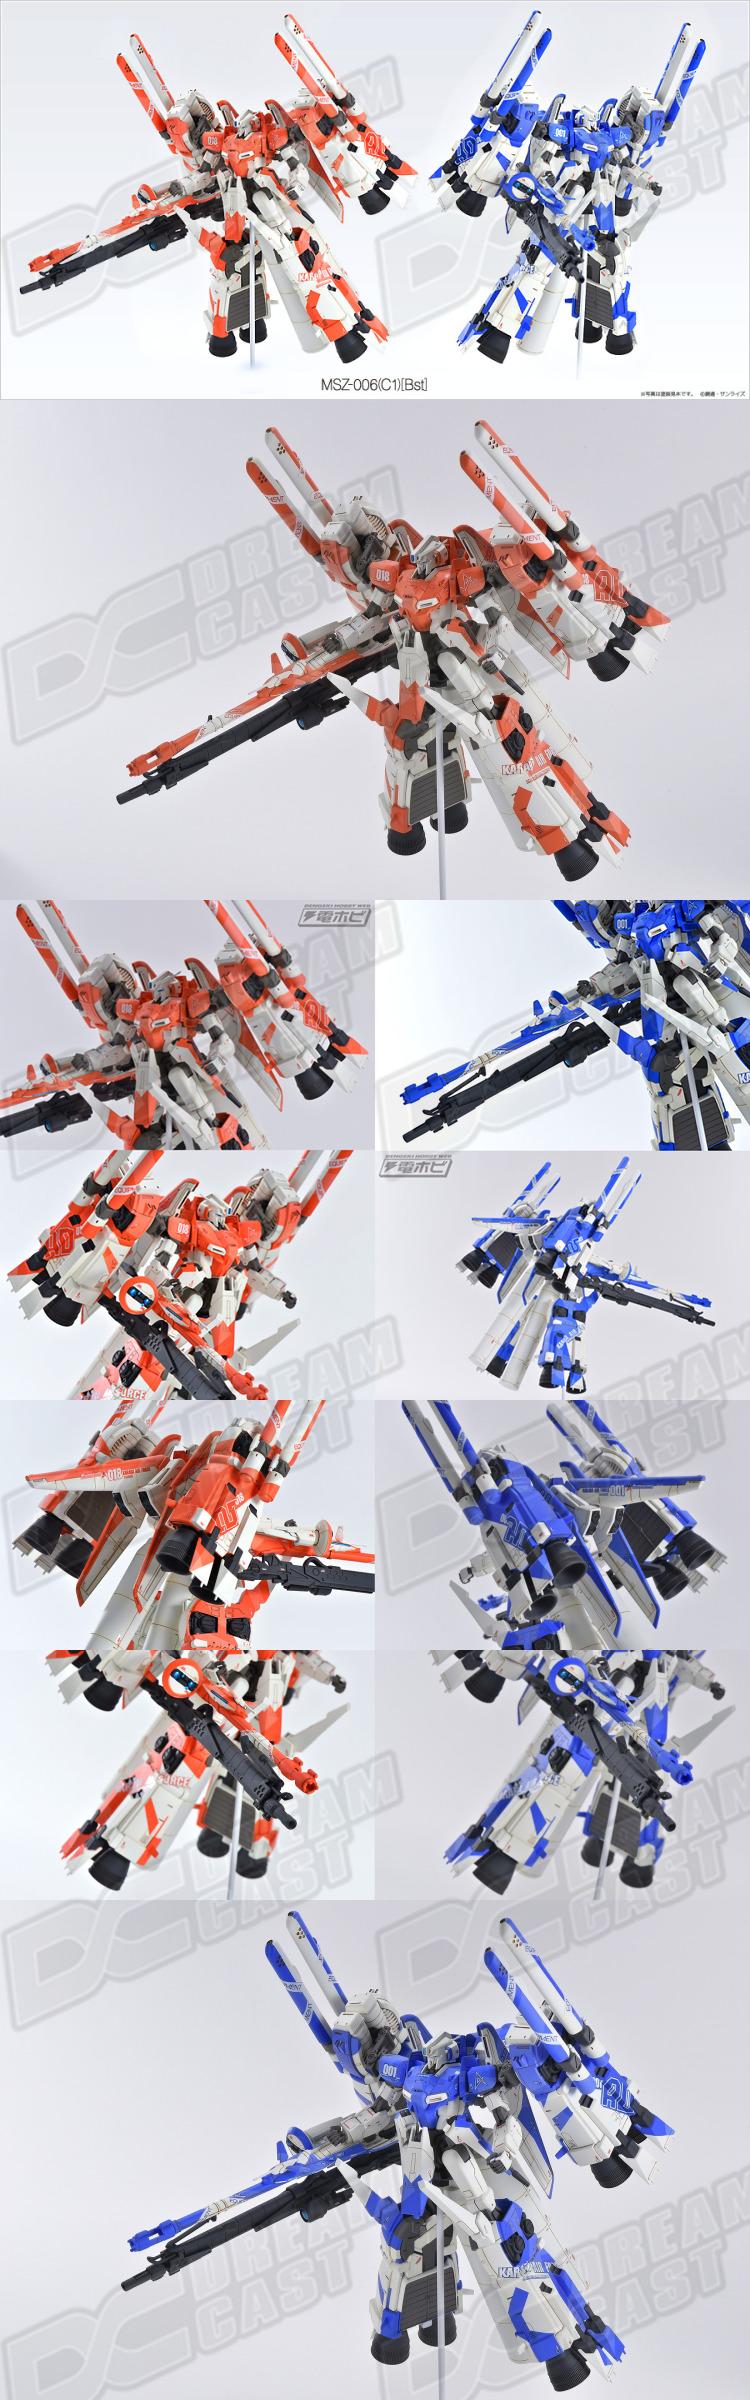 G611_144_MSZ_006_C1_Bst_zetaplus_008.jpg